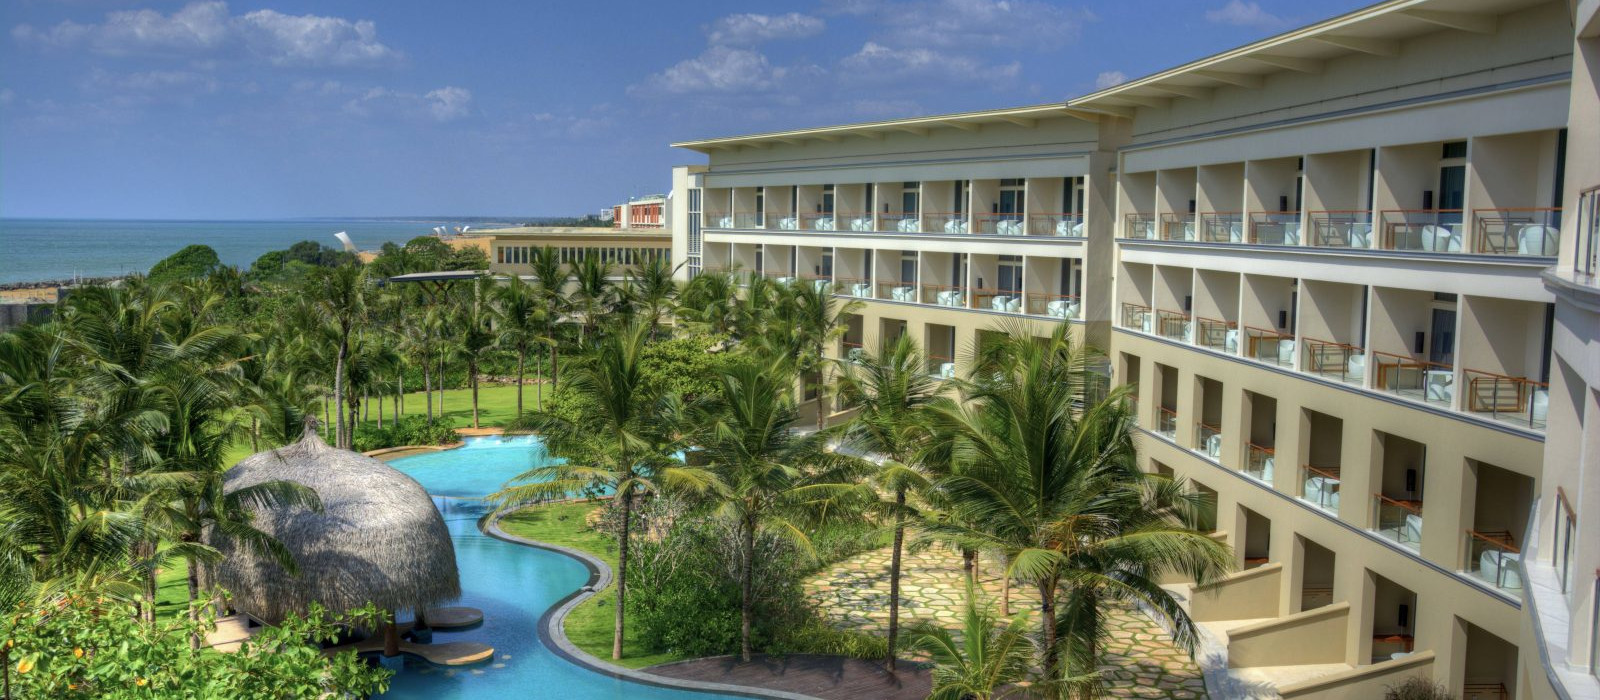 Hotel Heritance Negombo Sri Lanka